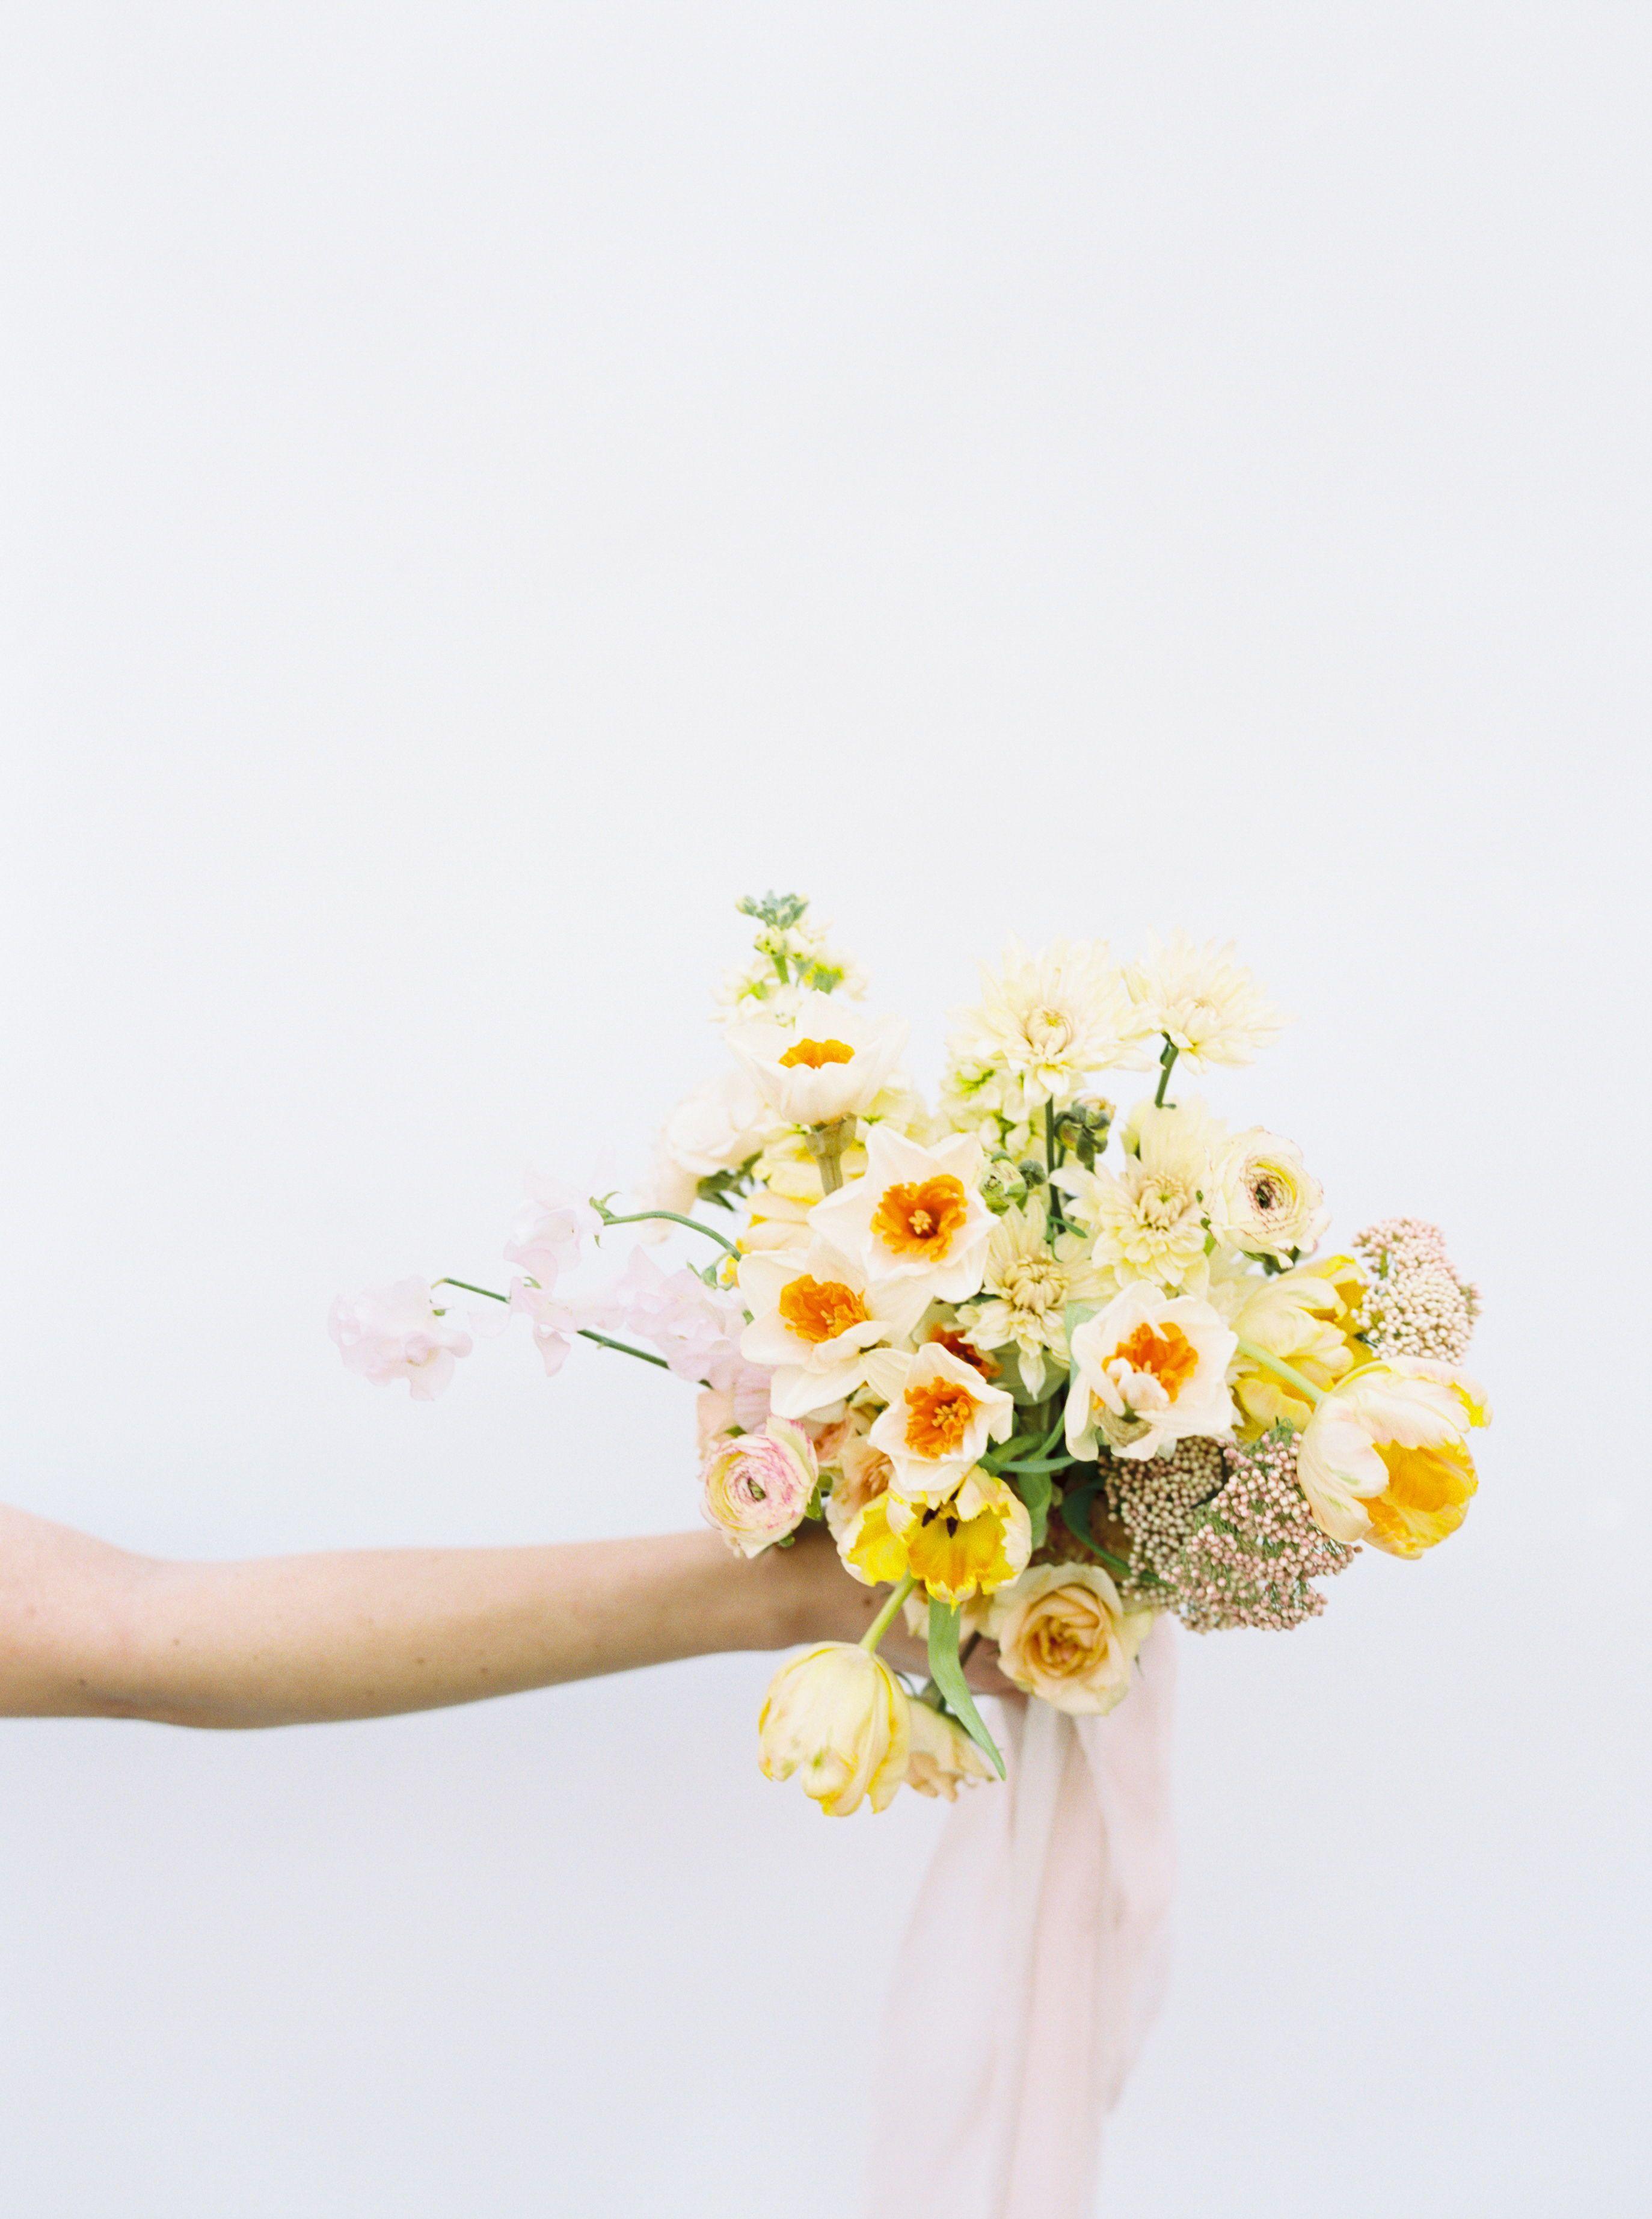 Kim Branagan Photography Bridal Bouquet Destination Wedding